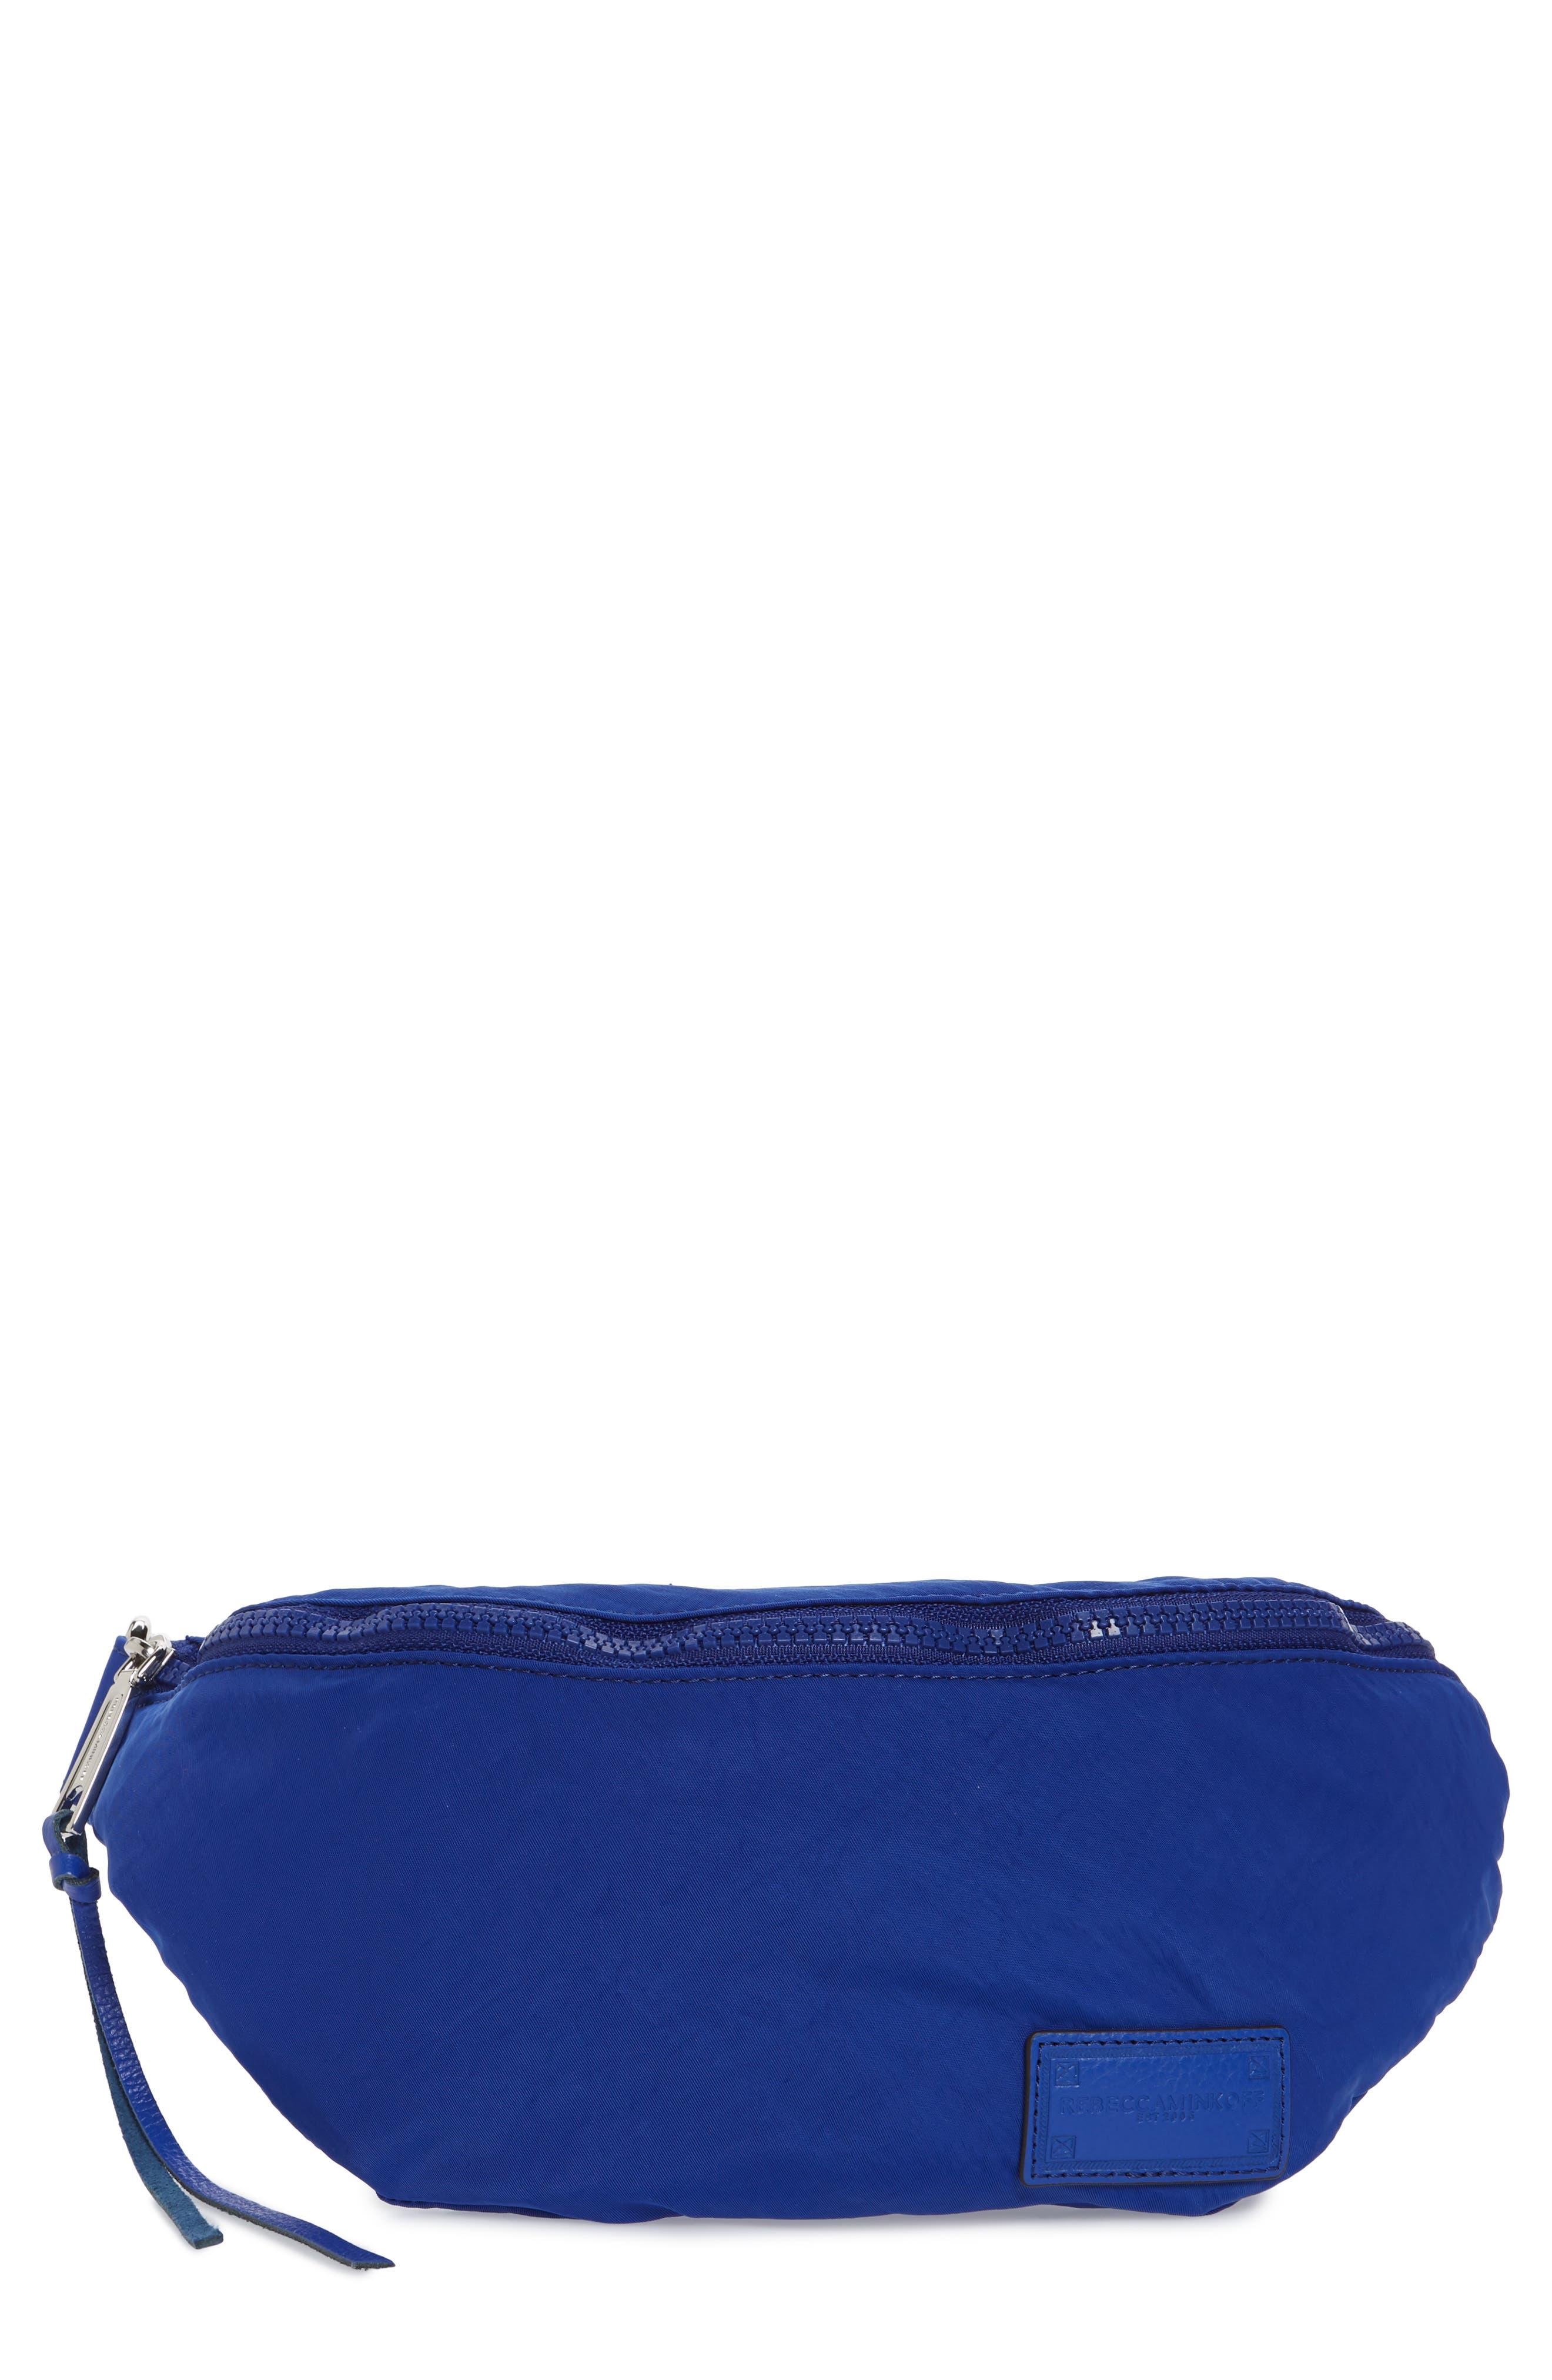 REBECCA MINKOFF, Nylon Belt Bag, Main thumbnail 1, color, BRIGHT BLUE